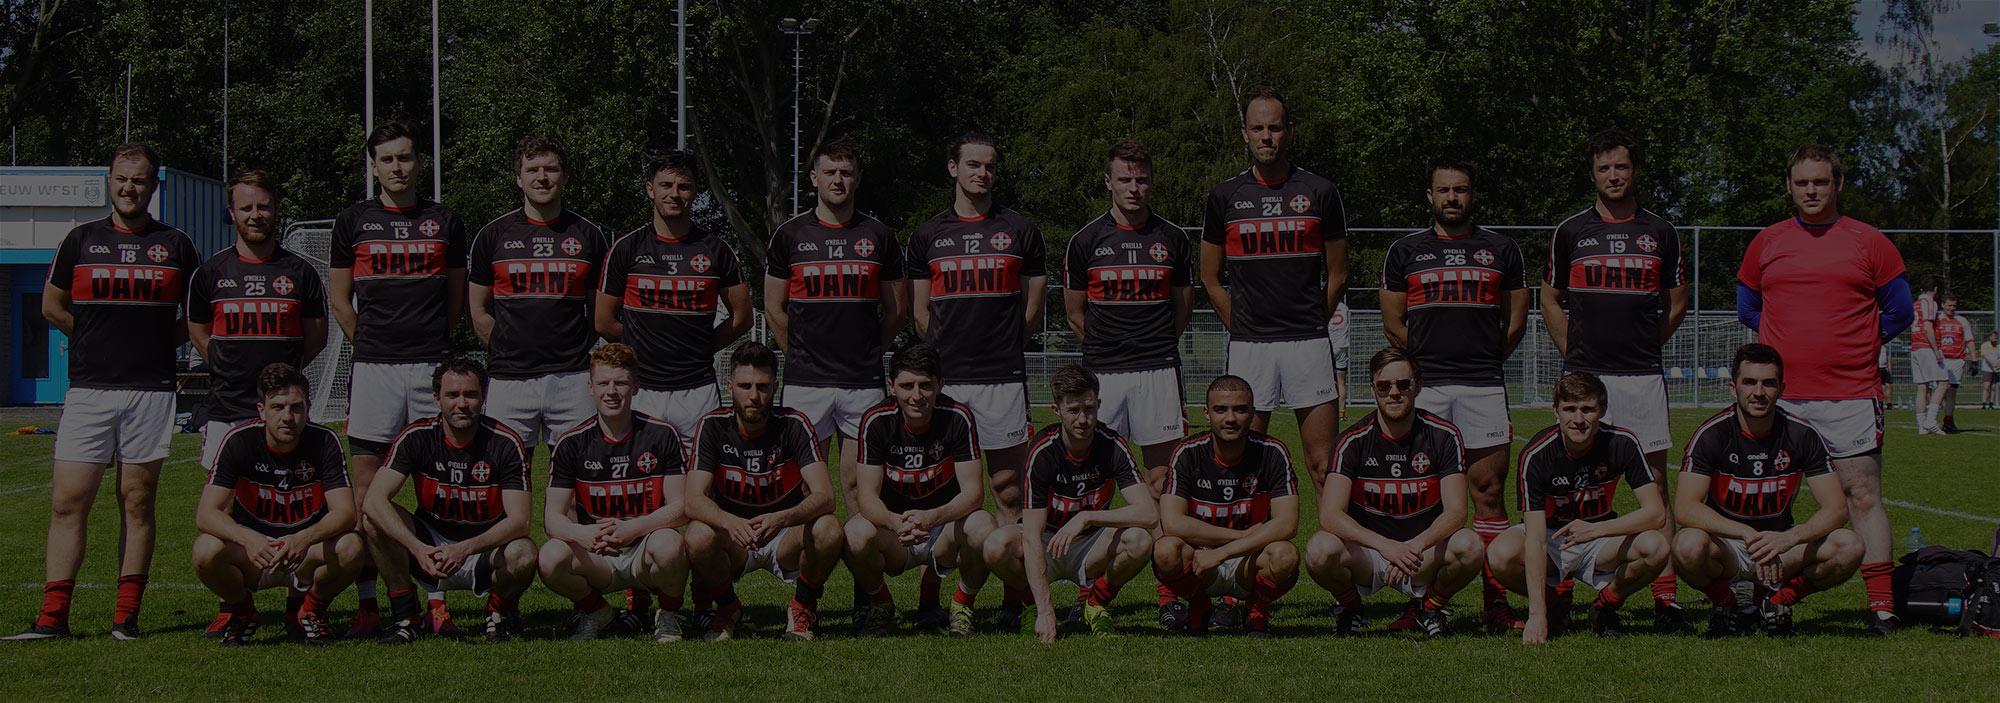 Amsterdam GAC Team